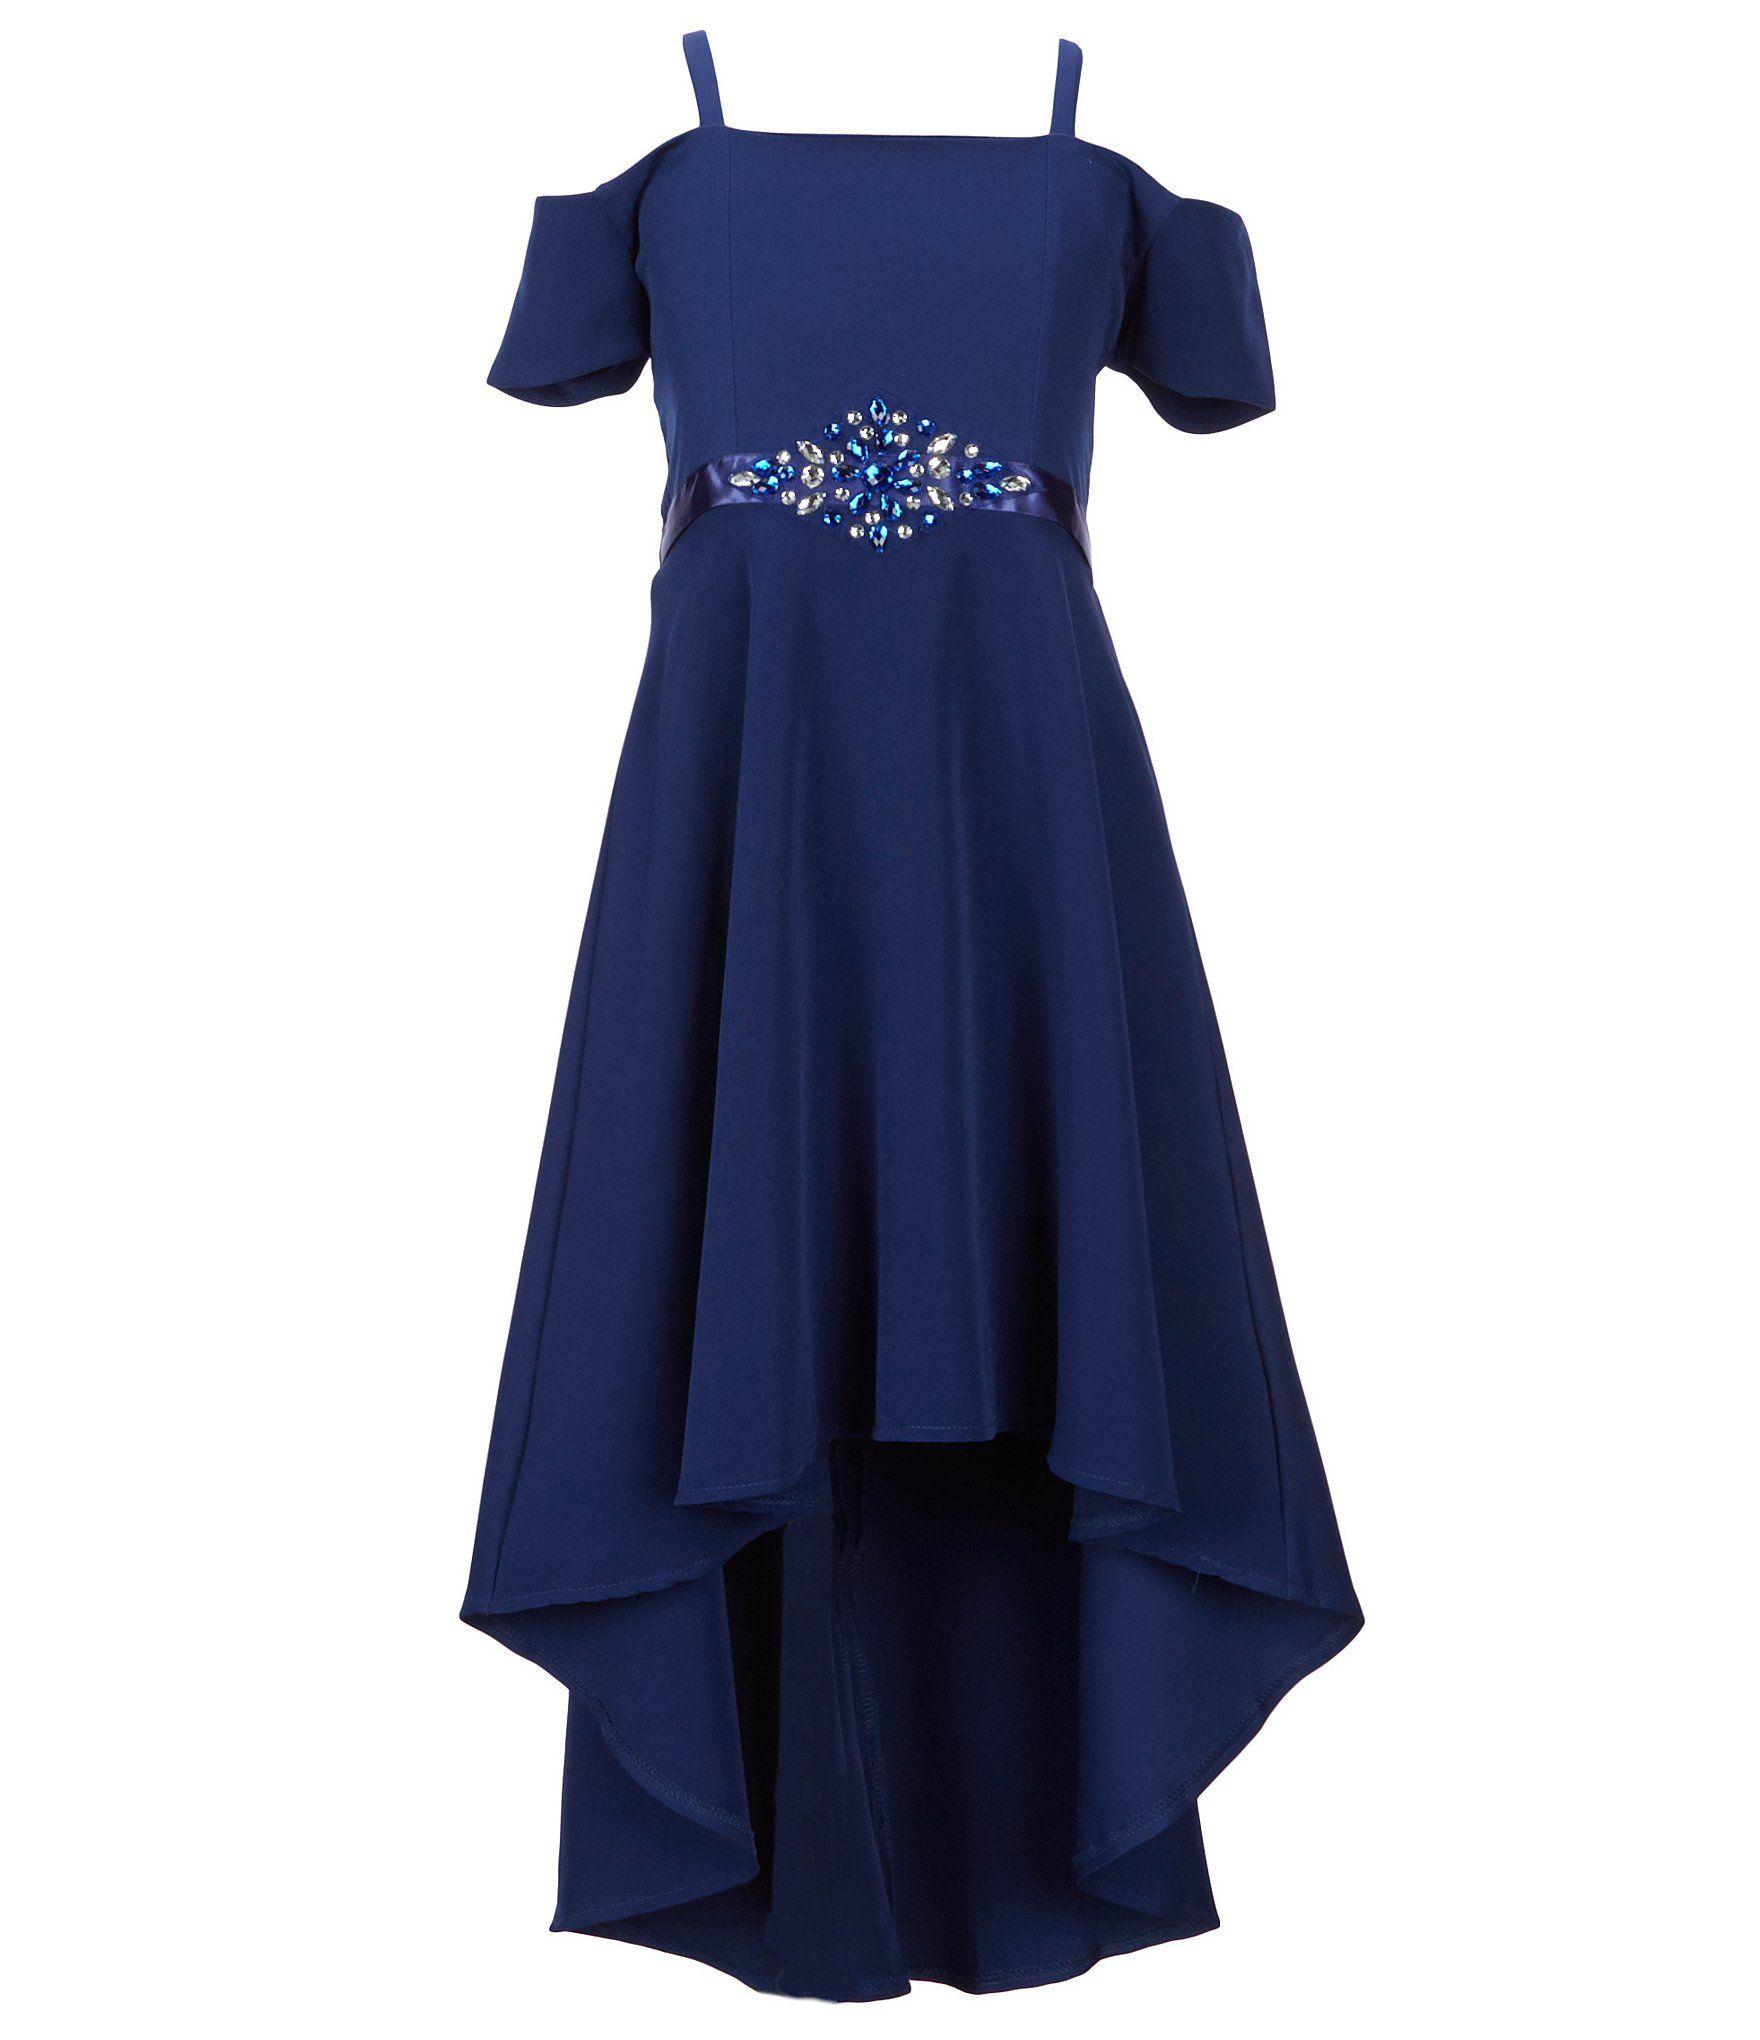 pin on 7th grade formal dresses